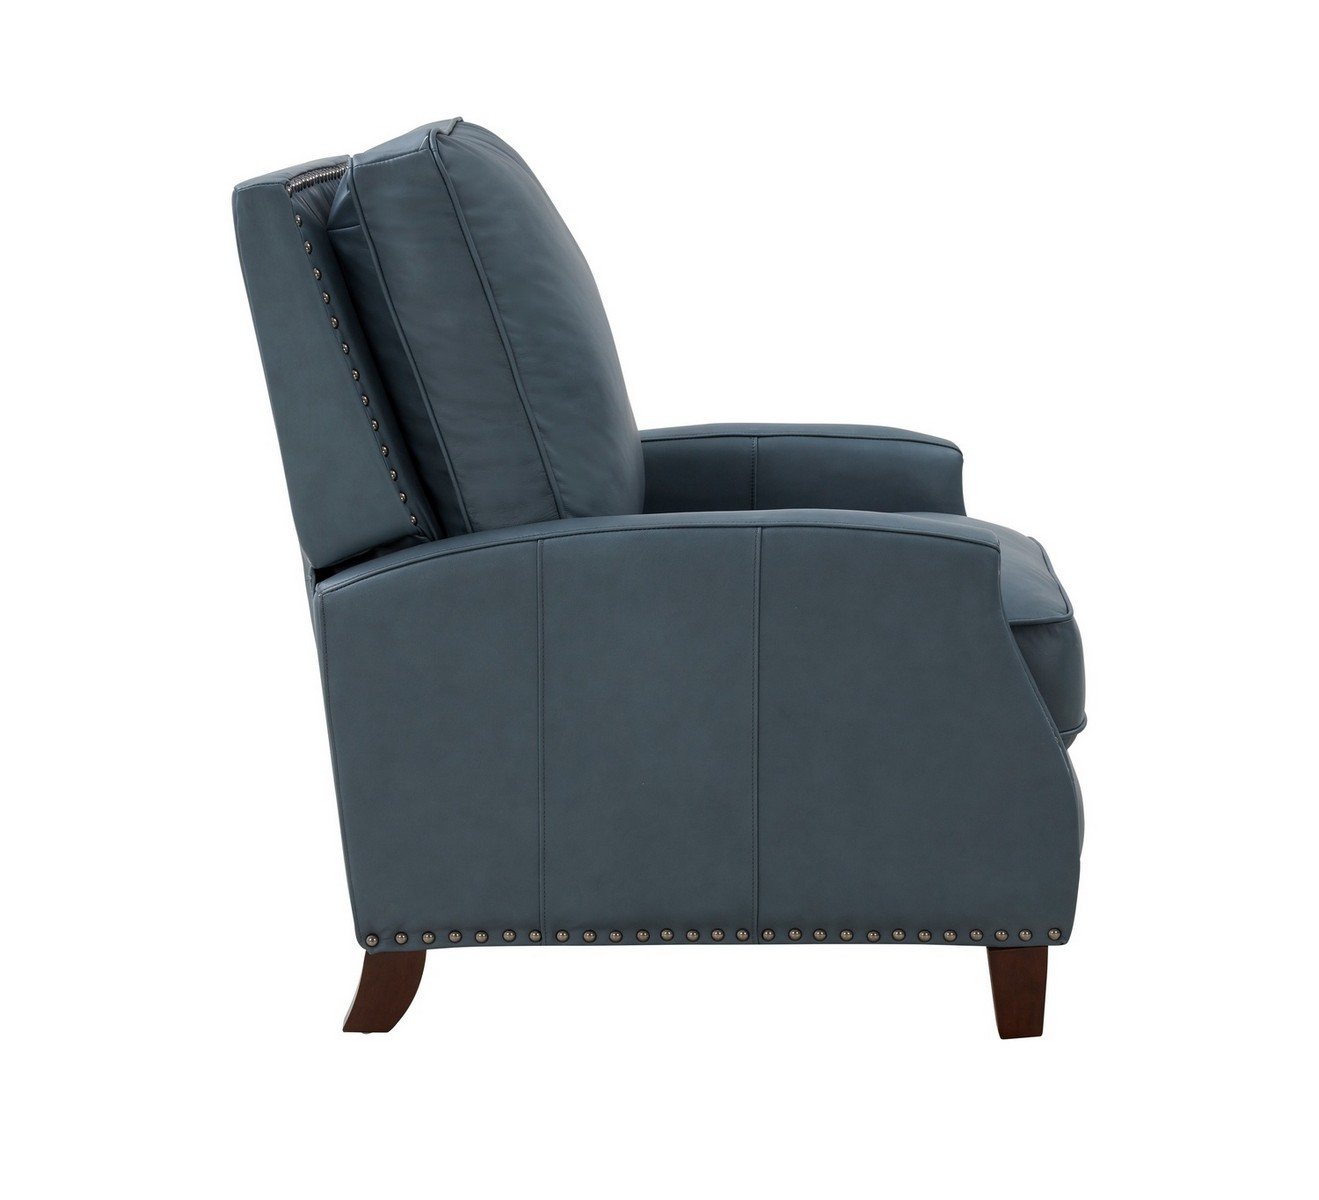 Barcalounger Melrose Recliner Chair - Corbett Steel Gray/All Leather